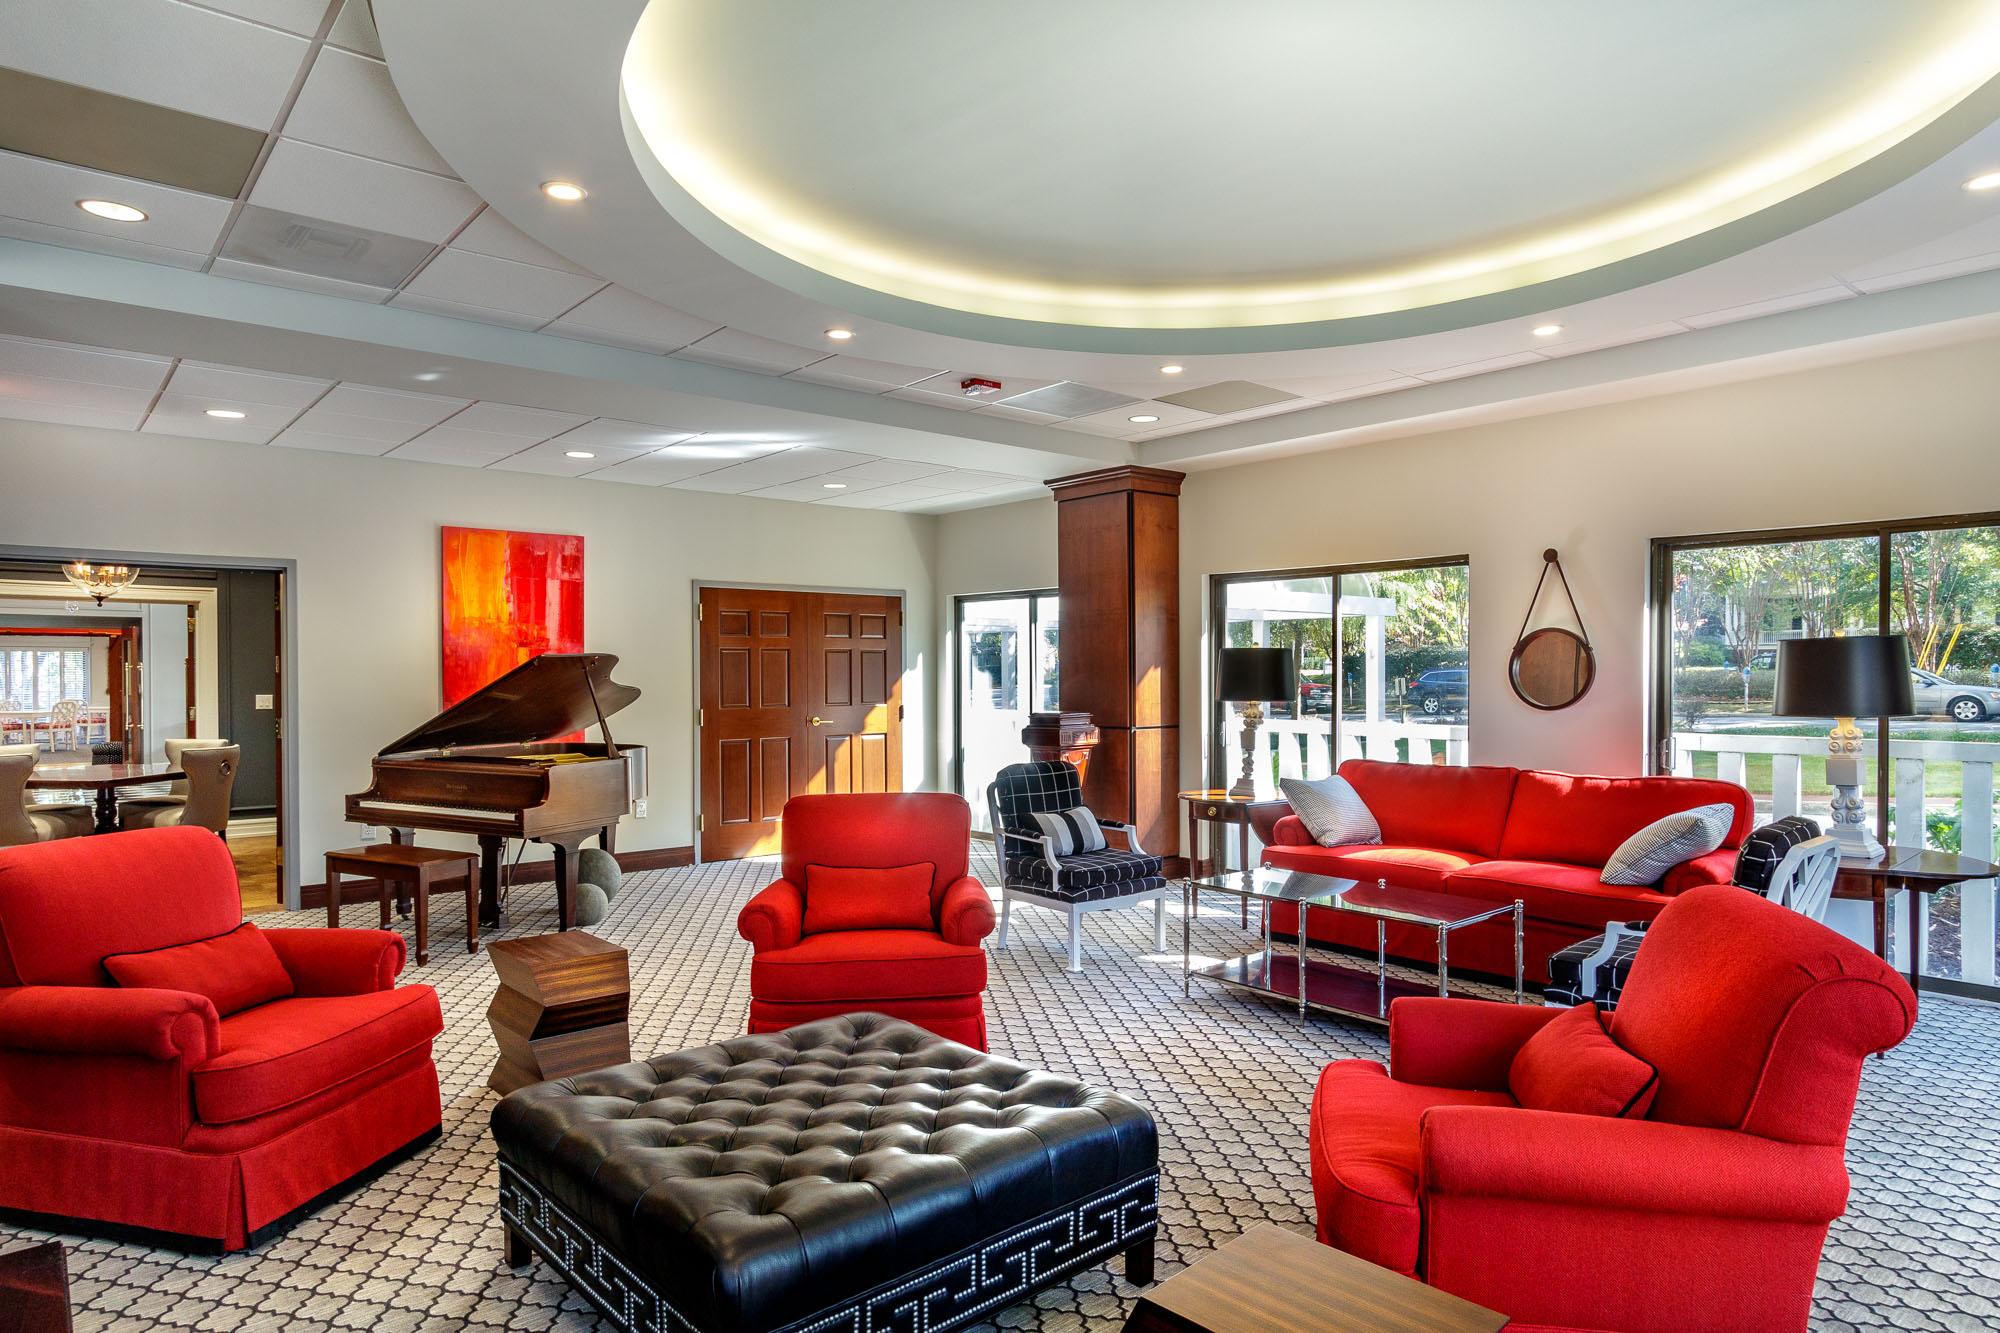 Heritage-Lounge-5-oswalddesign-Lres.jpg